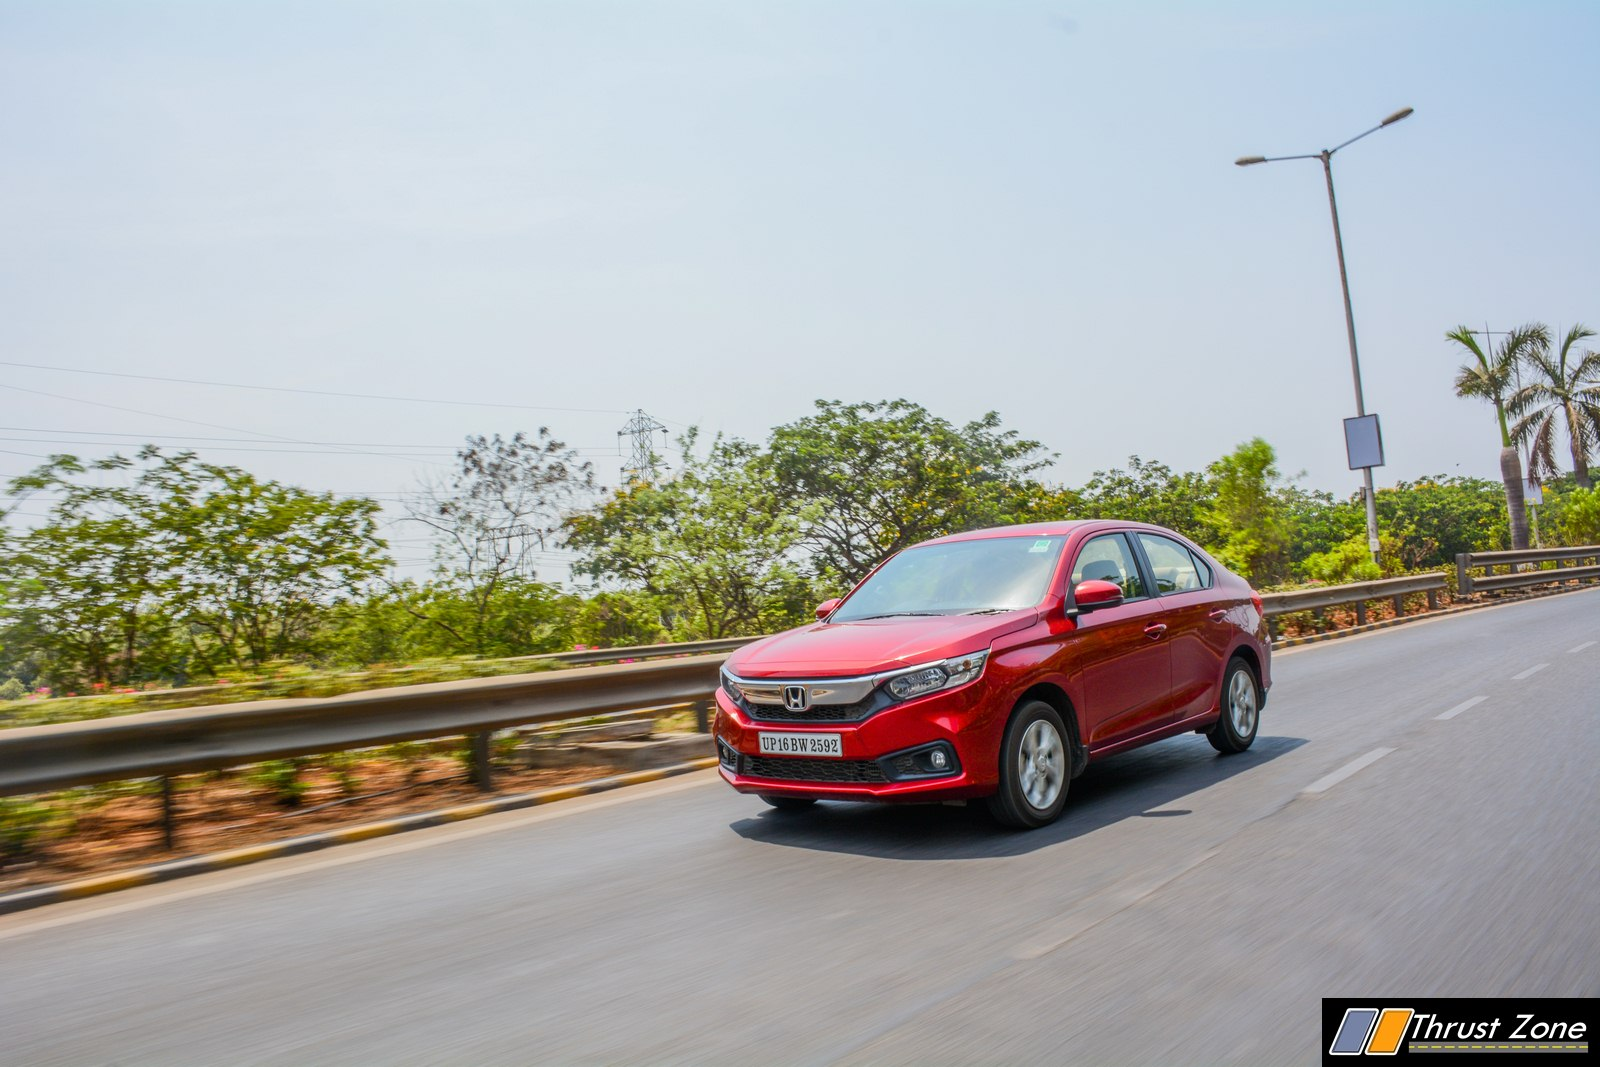 Honda-Amaze-CVT-Diesel-Review-16